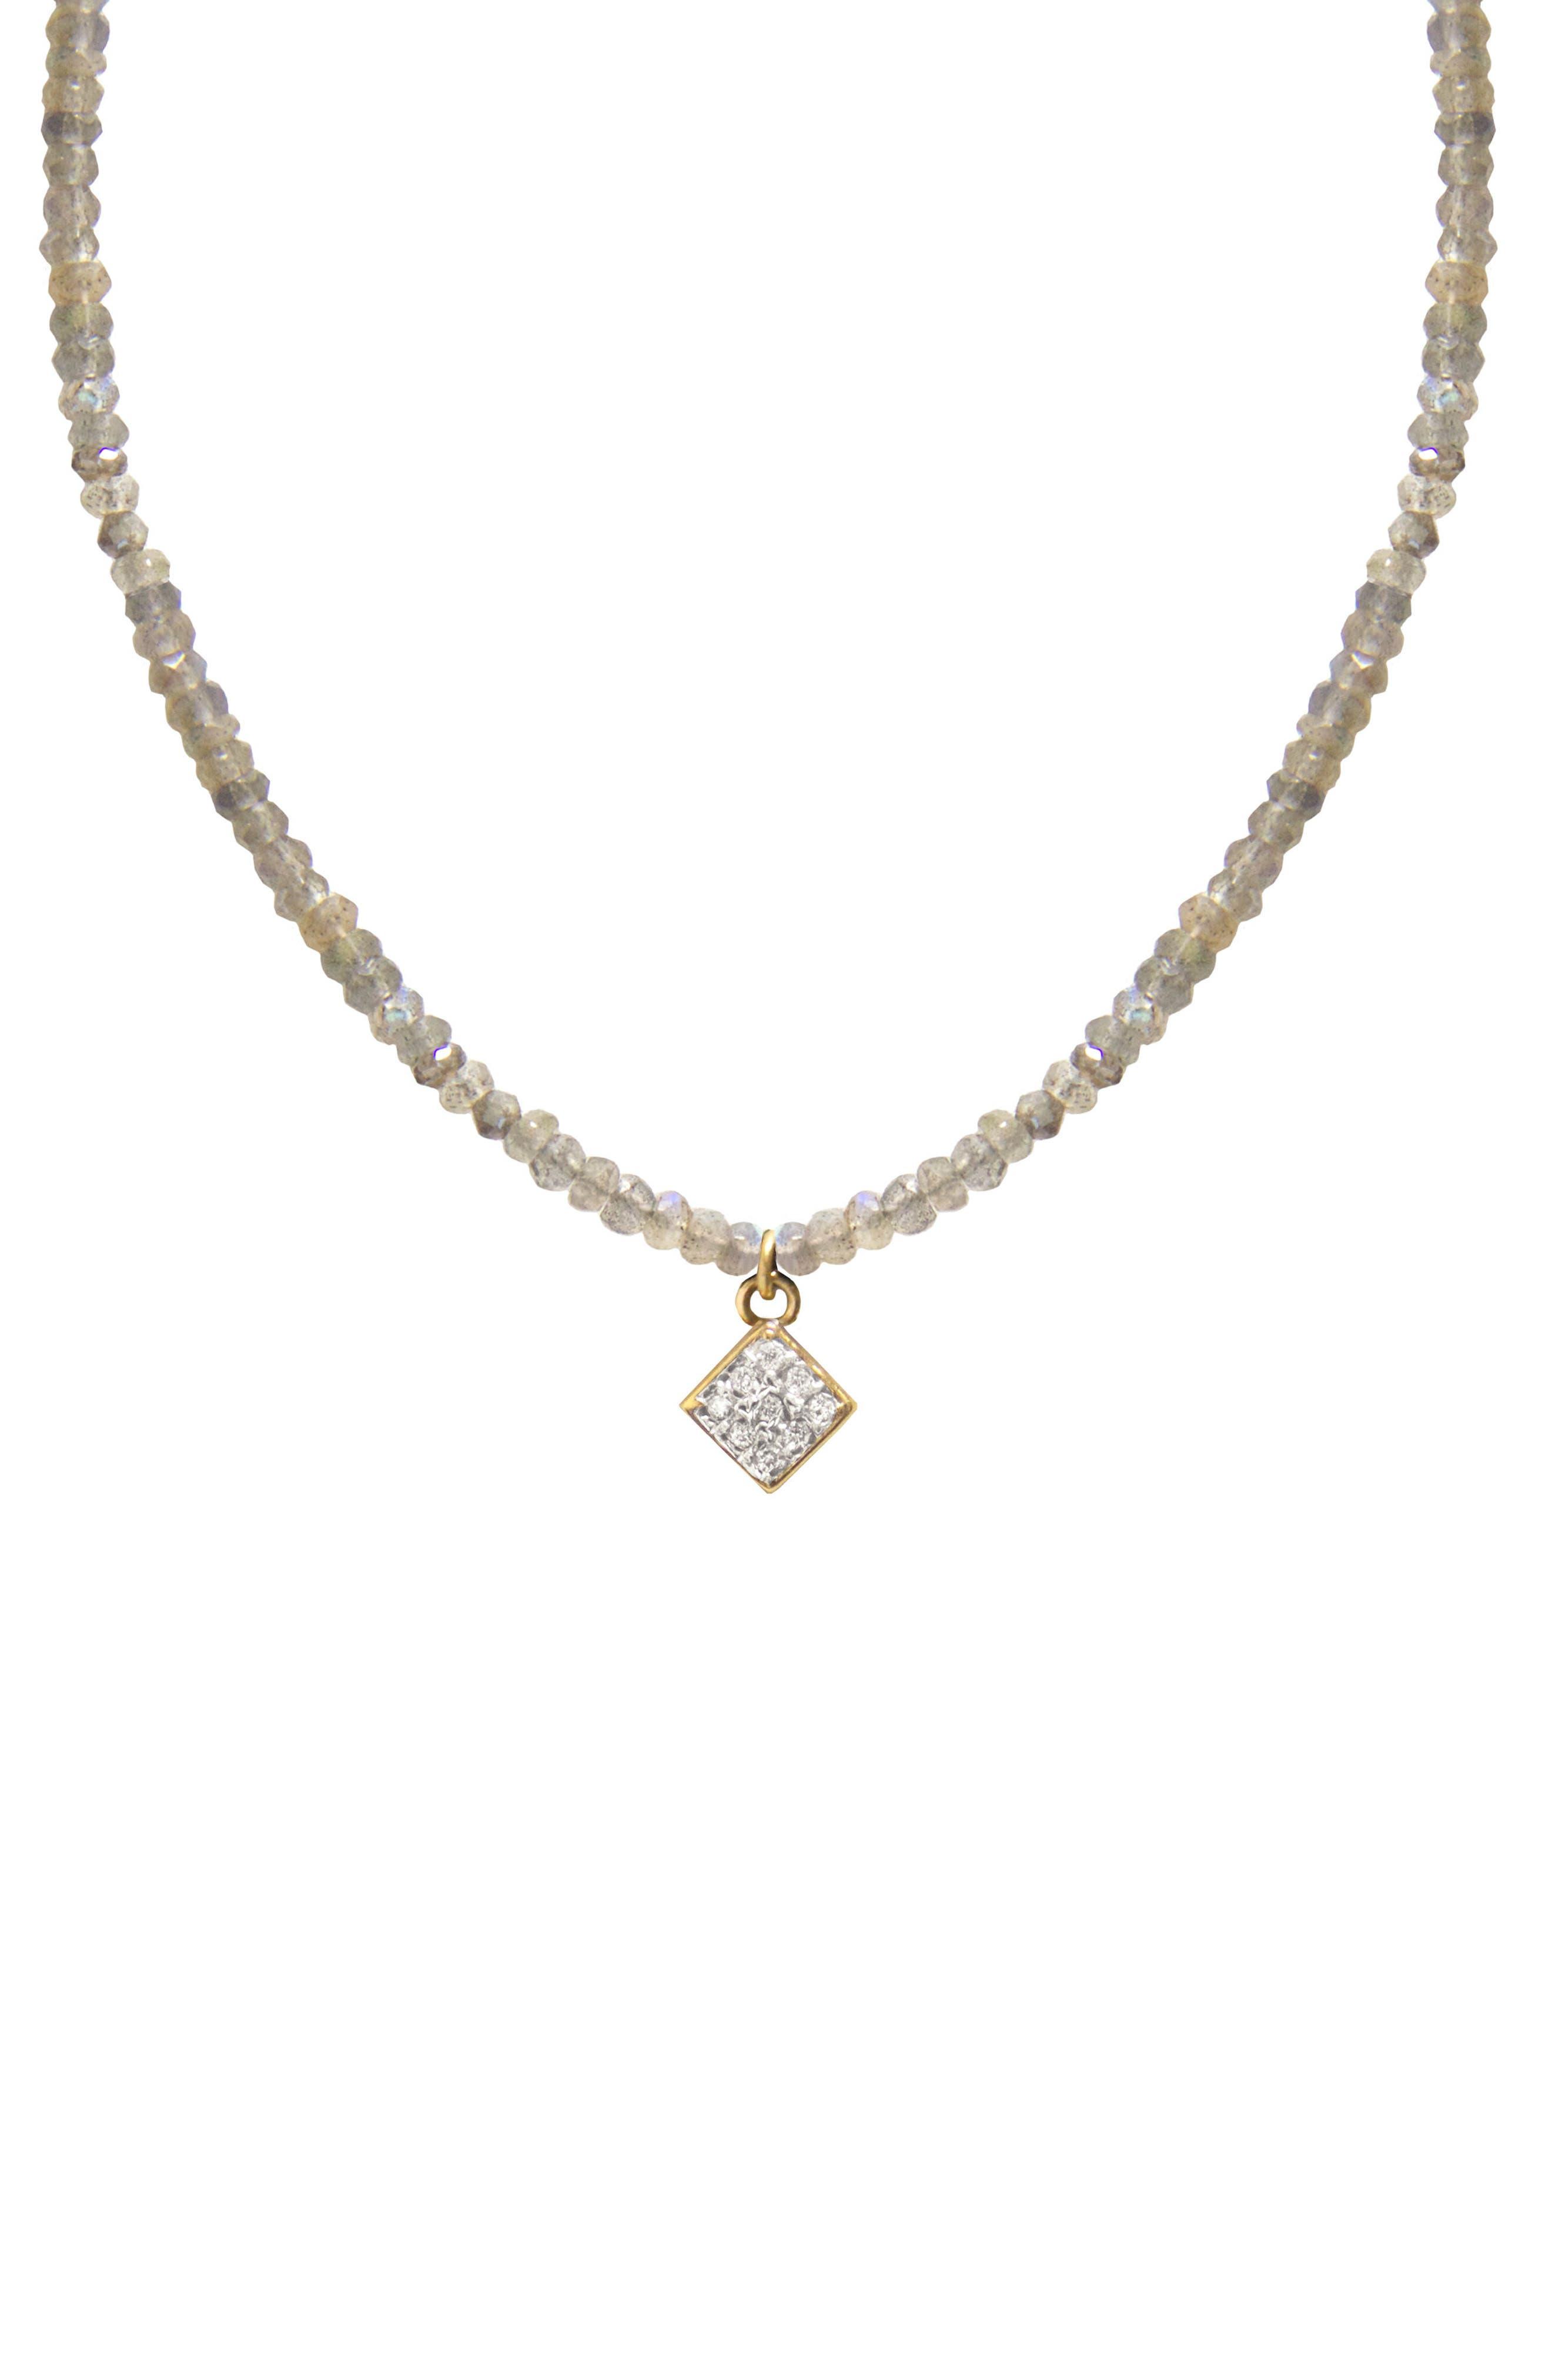 Jane Basch Diamond Charm Pendant Necklace,                             Main thumbnail 1, color,                             Labradorite